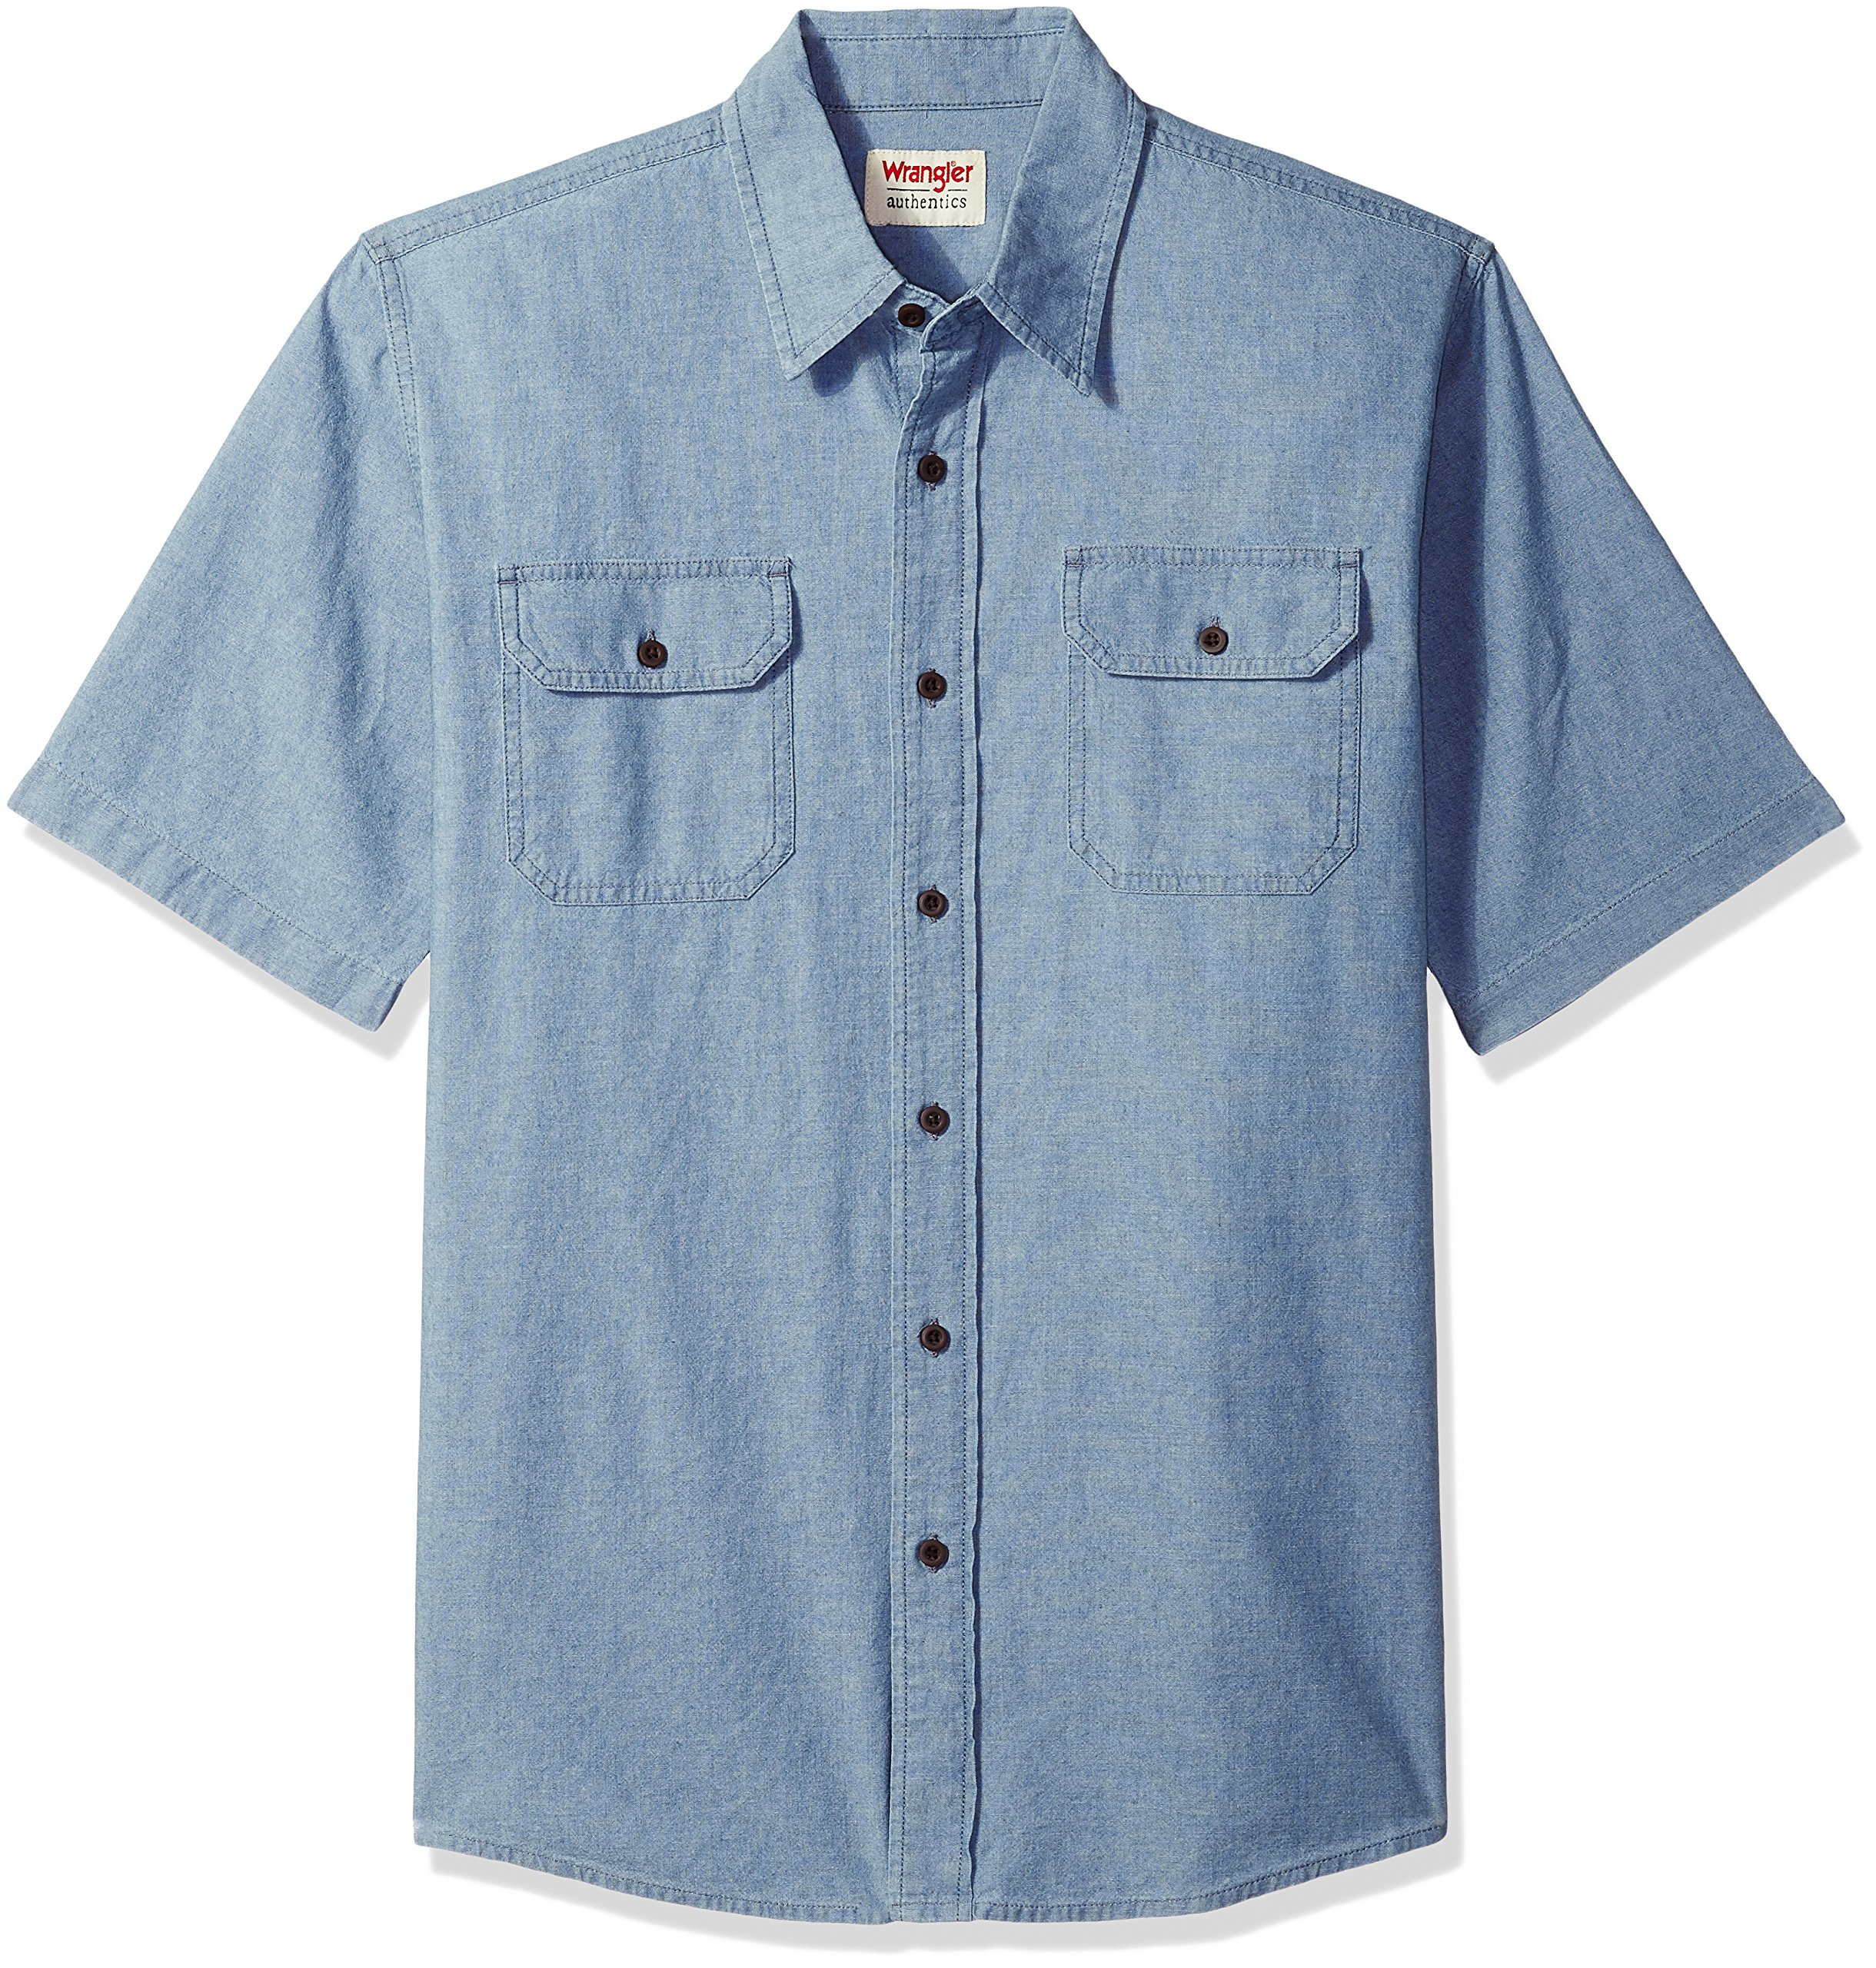 Wrangler Authentics Men's Short Sleeve Classic Woven Shirt, Light Chambray, XL